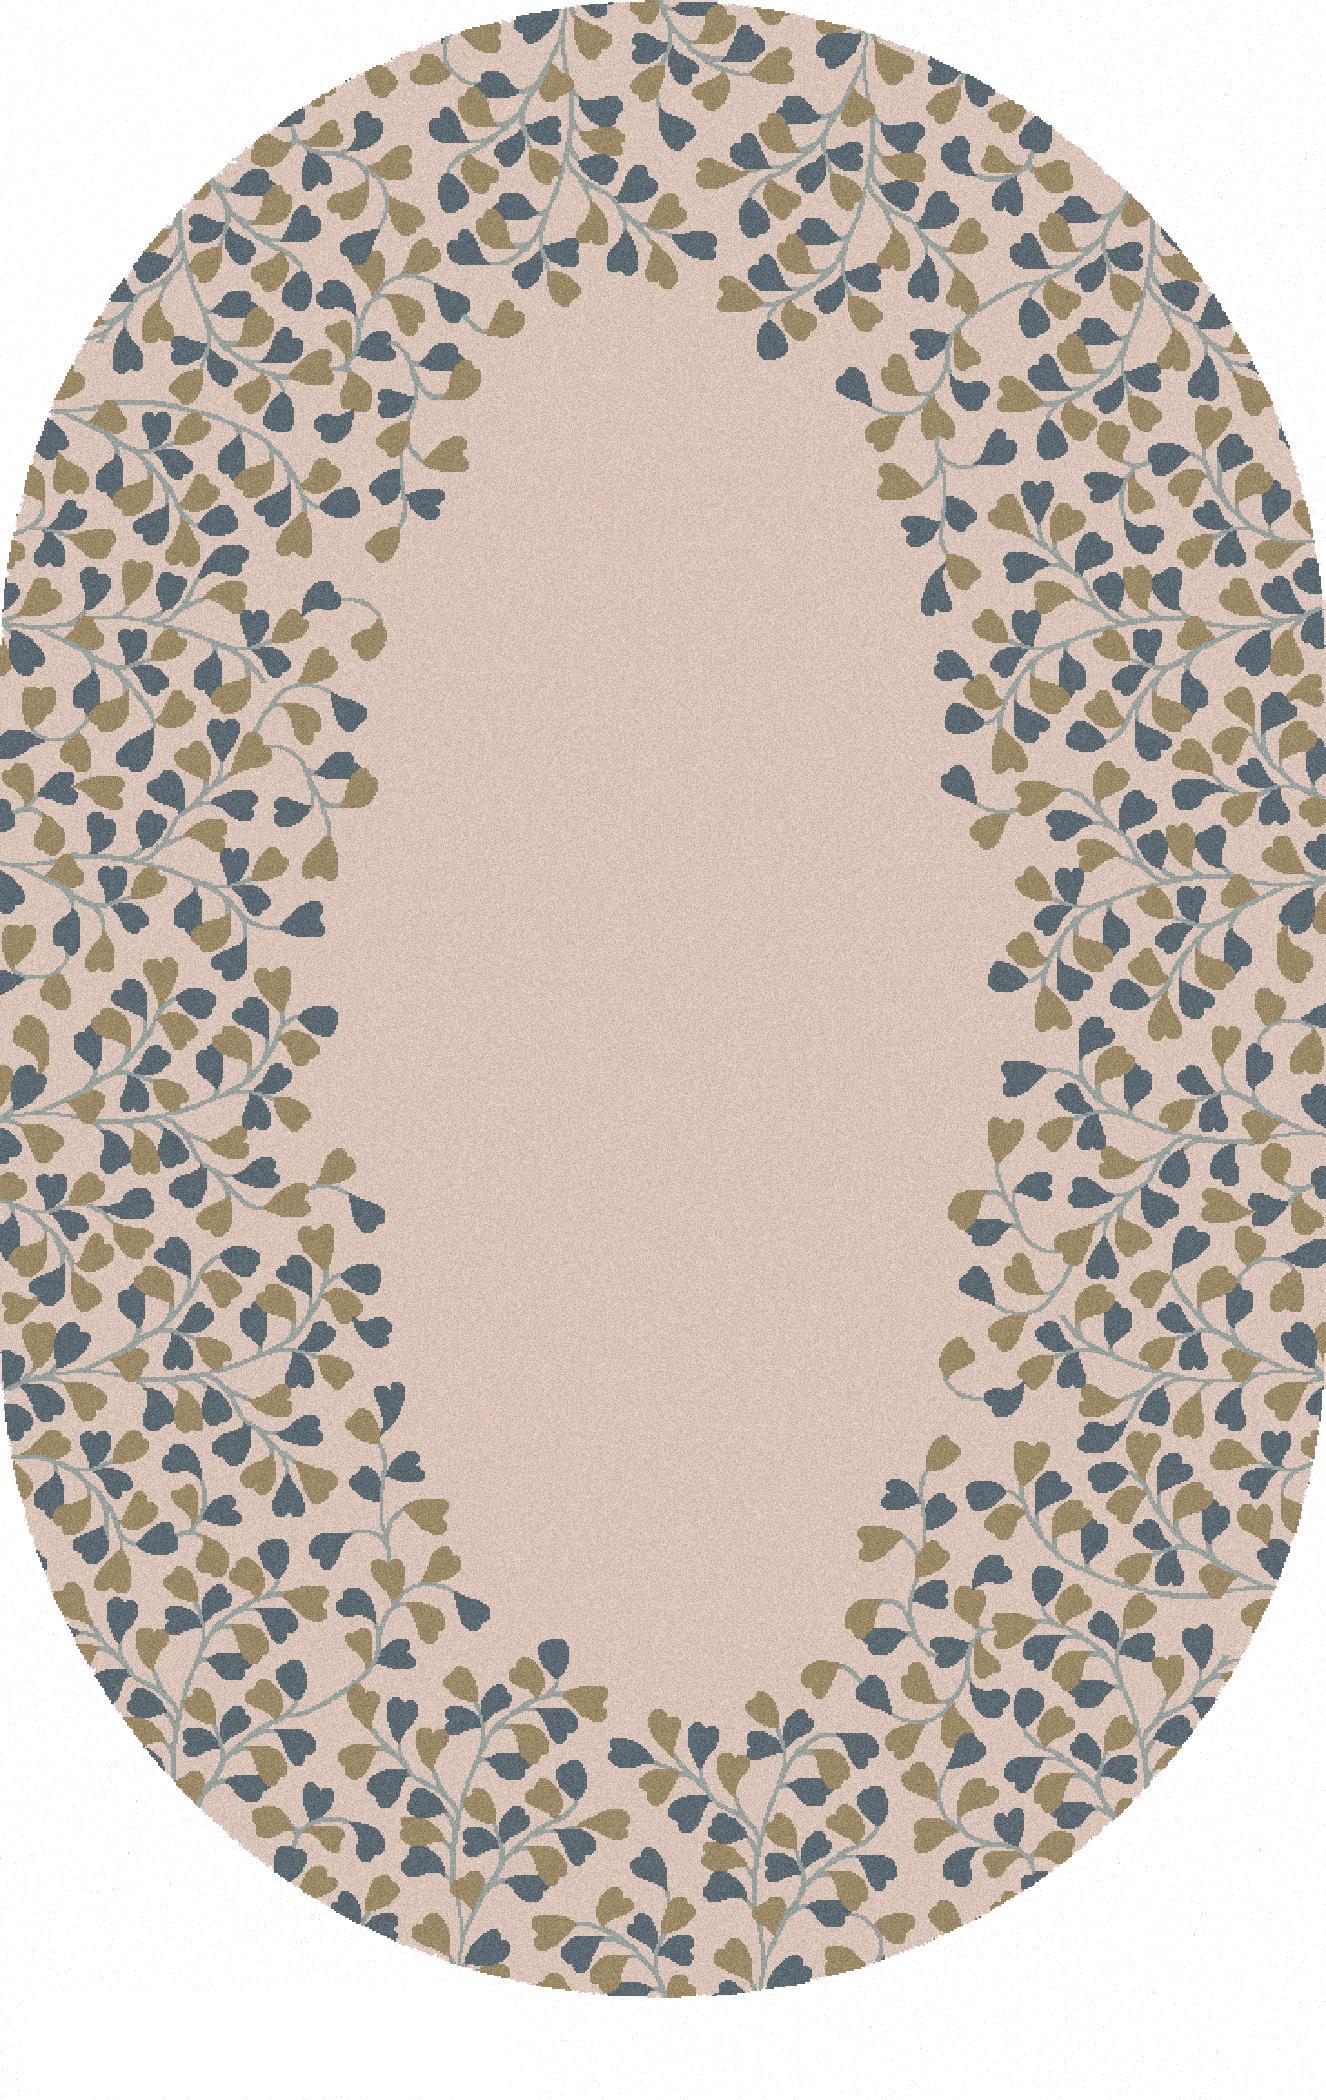 Surya Rugs Athena 8' x 10' Oval - Item Number: ATH5117-810OV